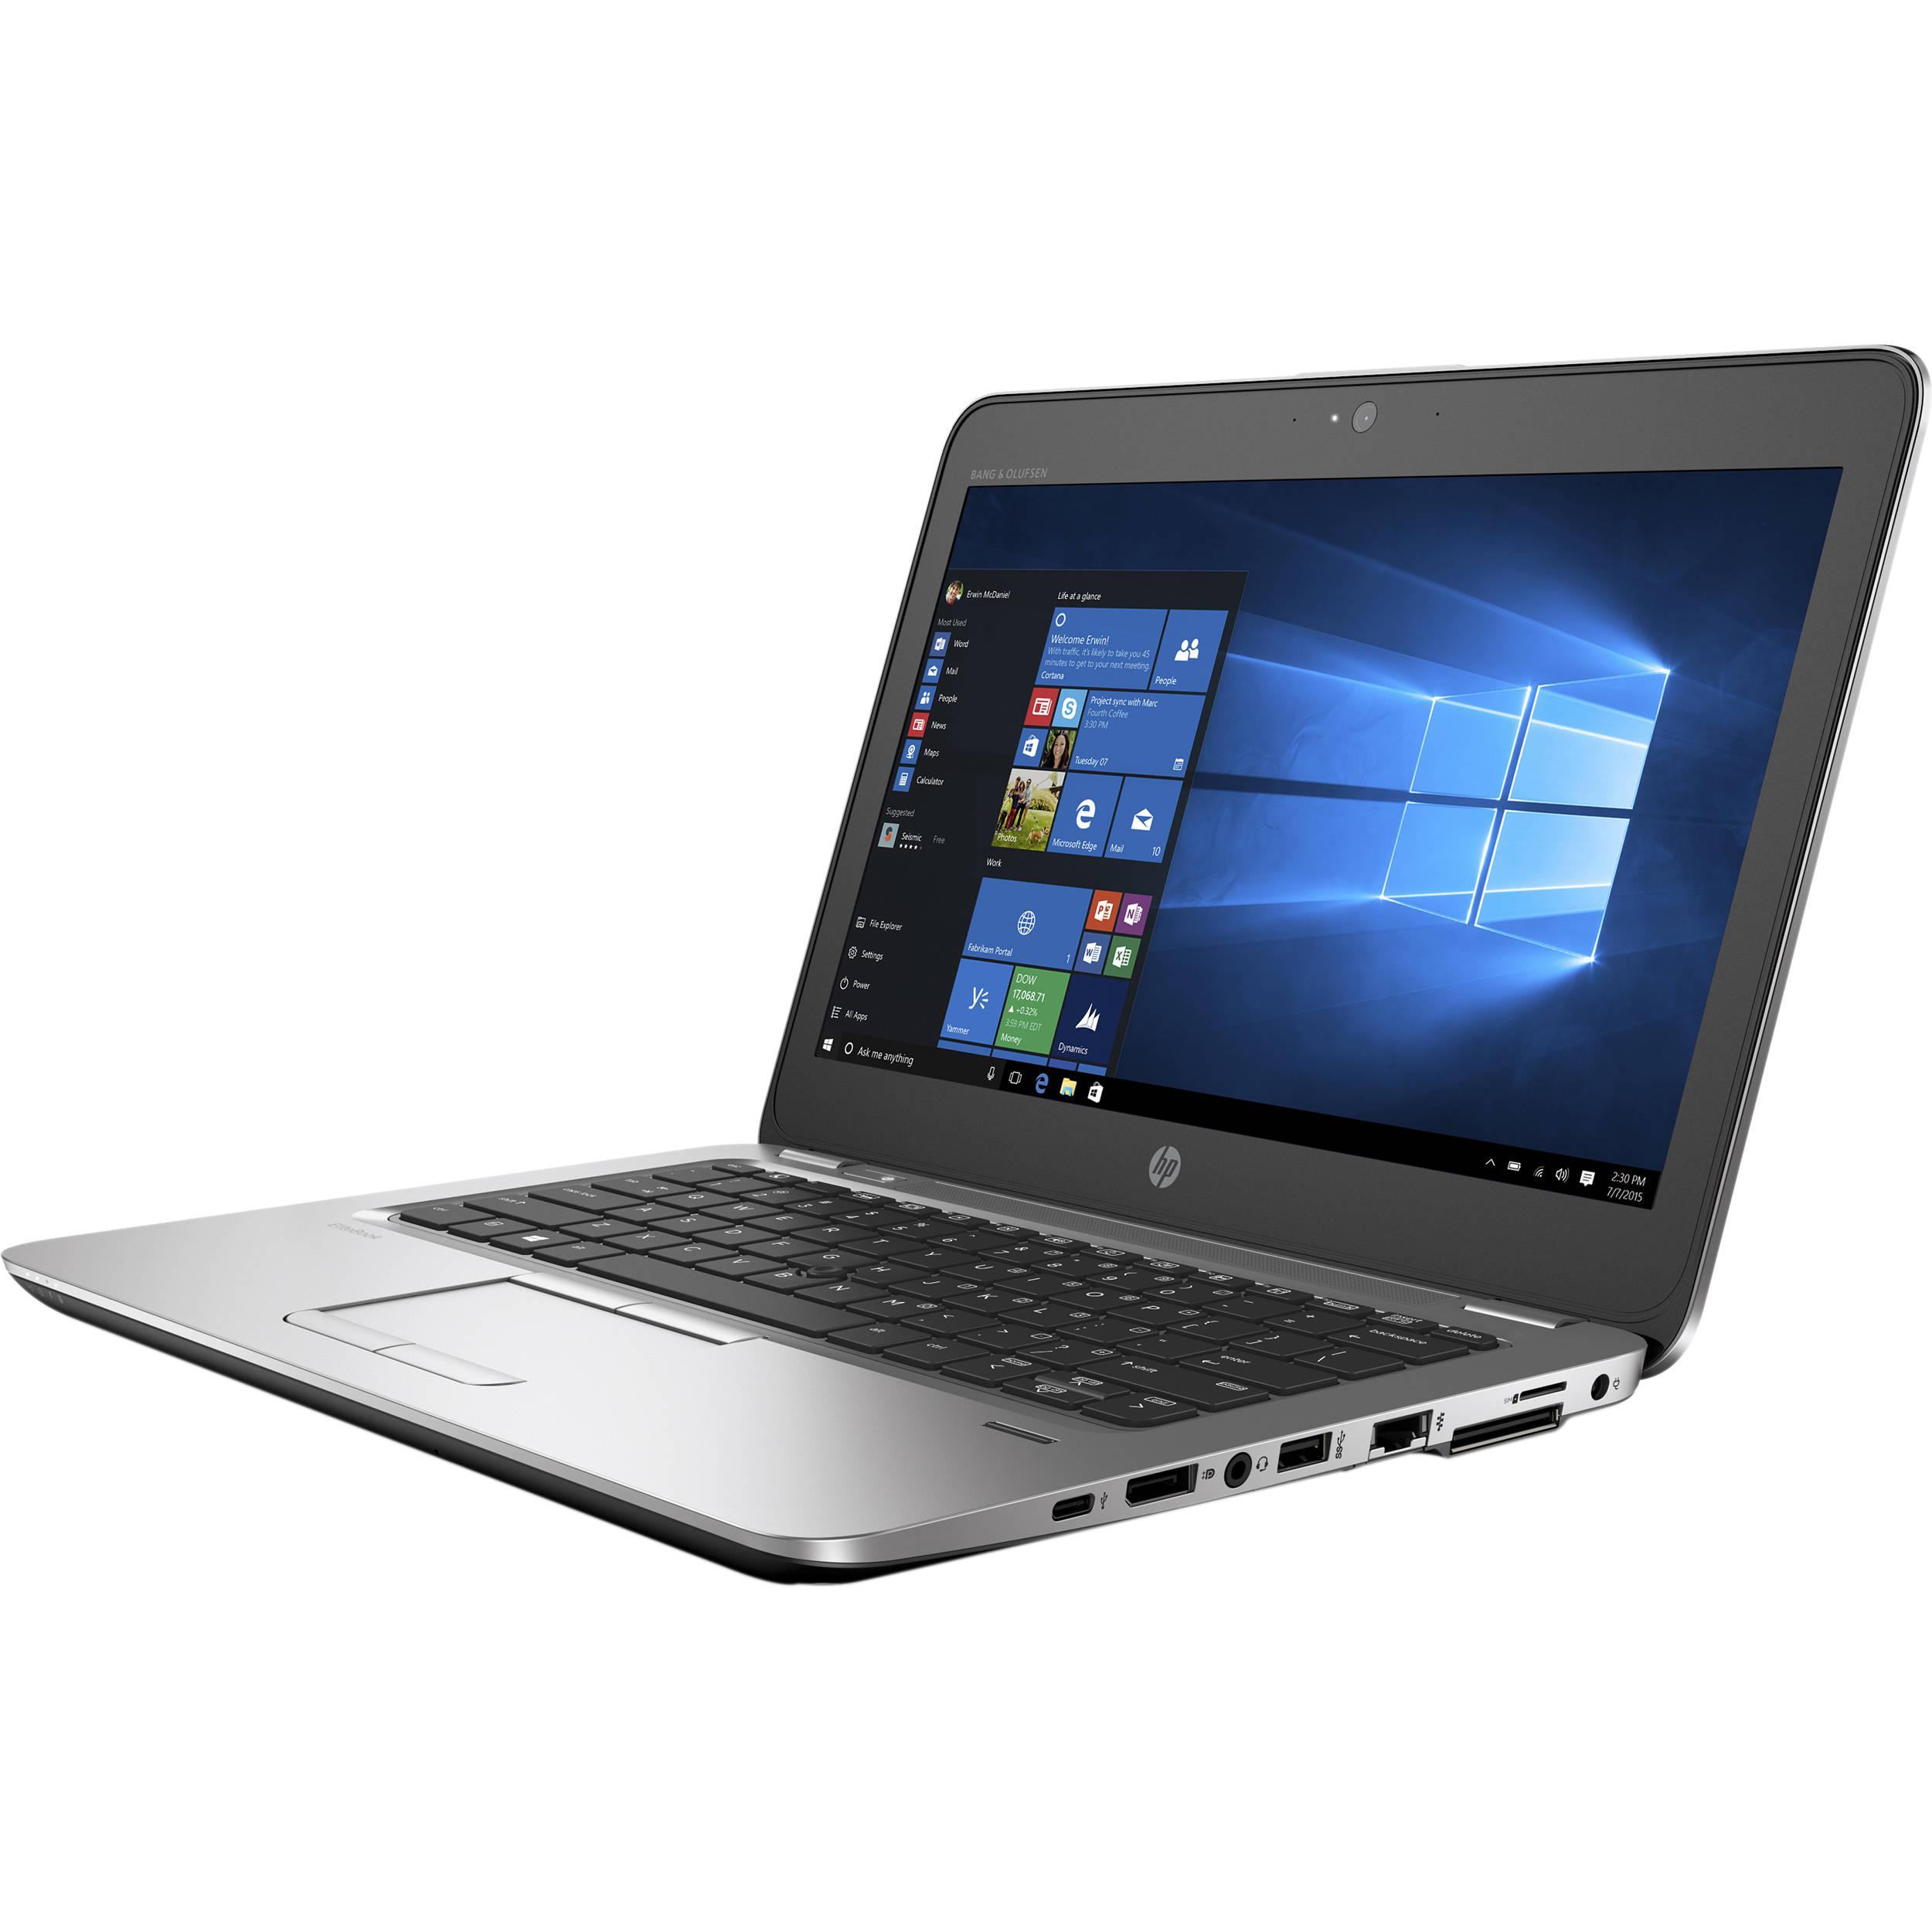 Hp EliteBook 820 G3 12.5-inch (2016) - Core i5-6300U - 8 GB  - SSD 256 GB